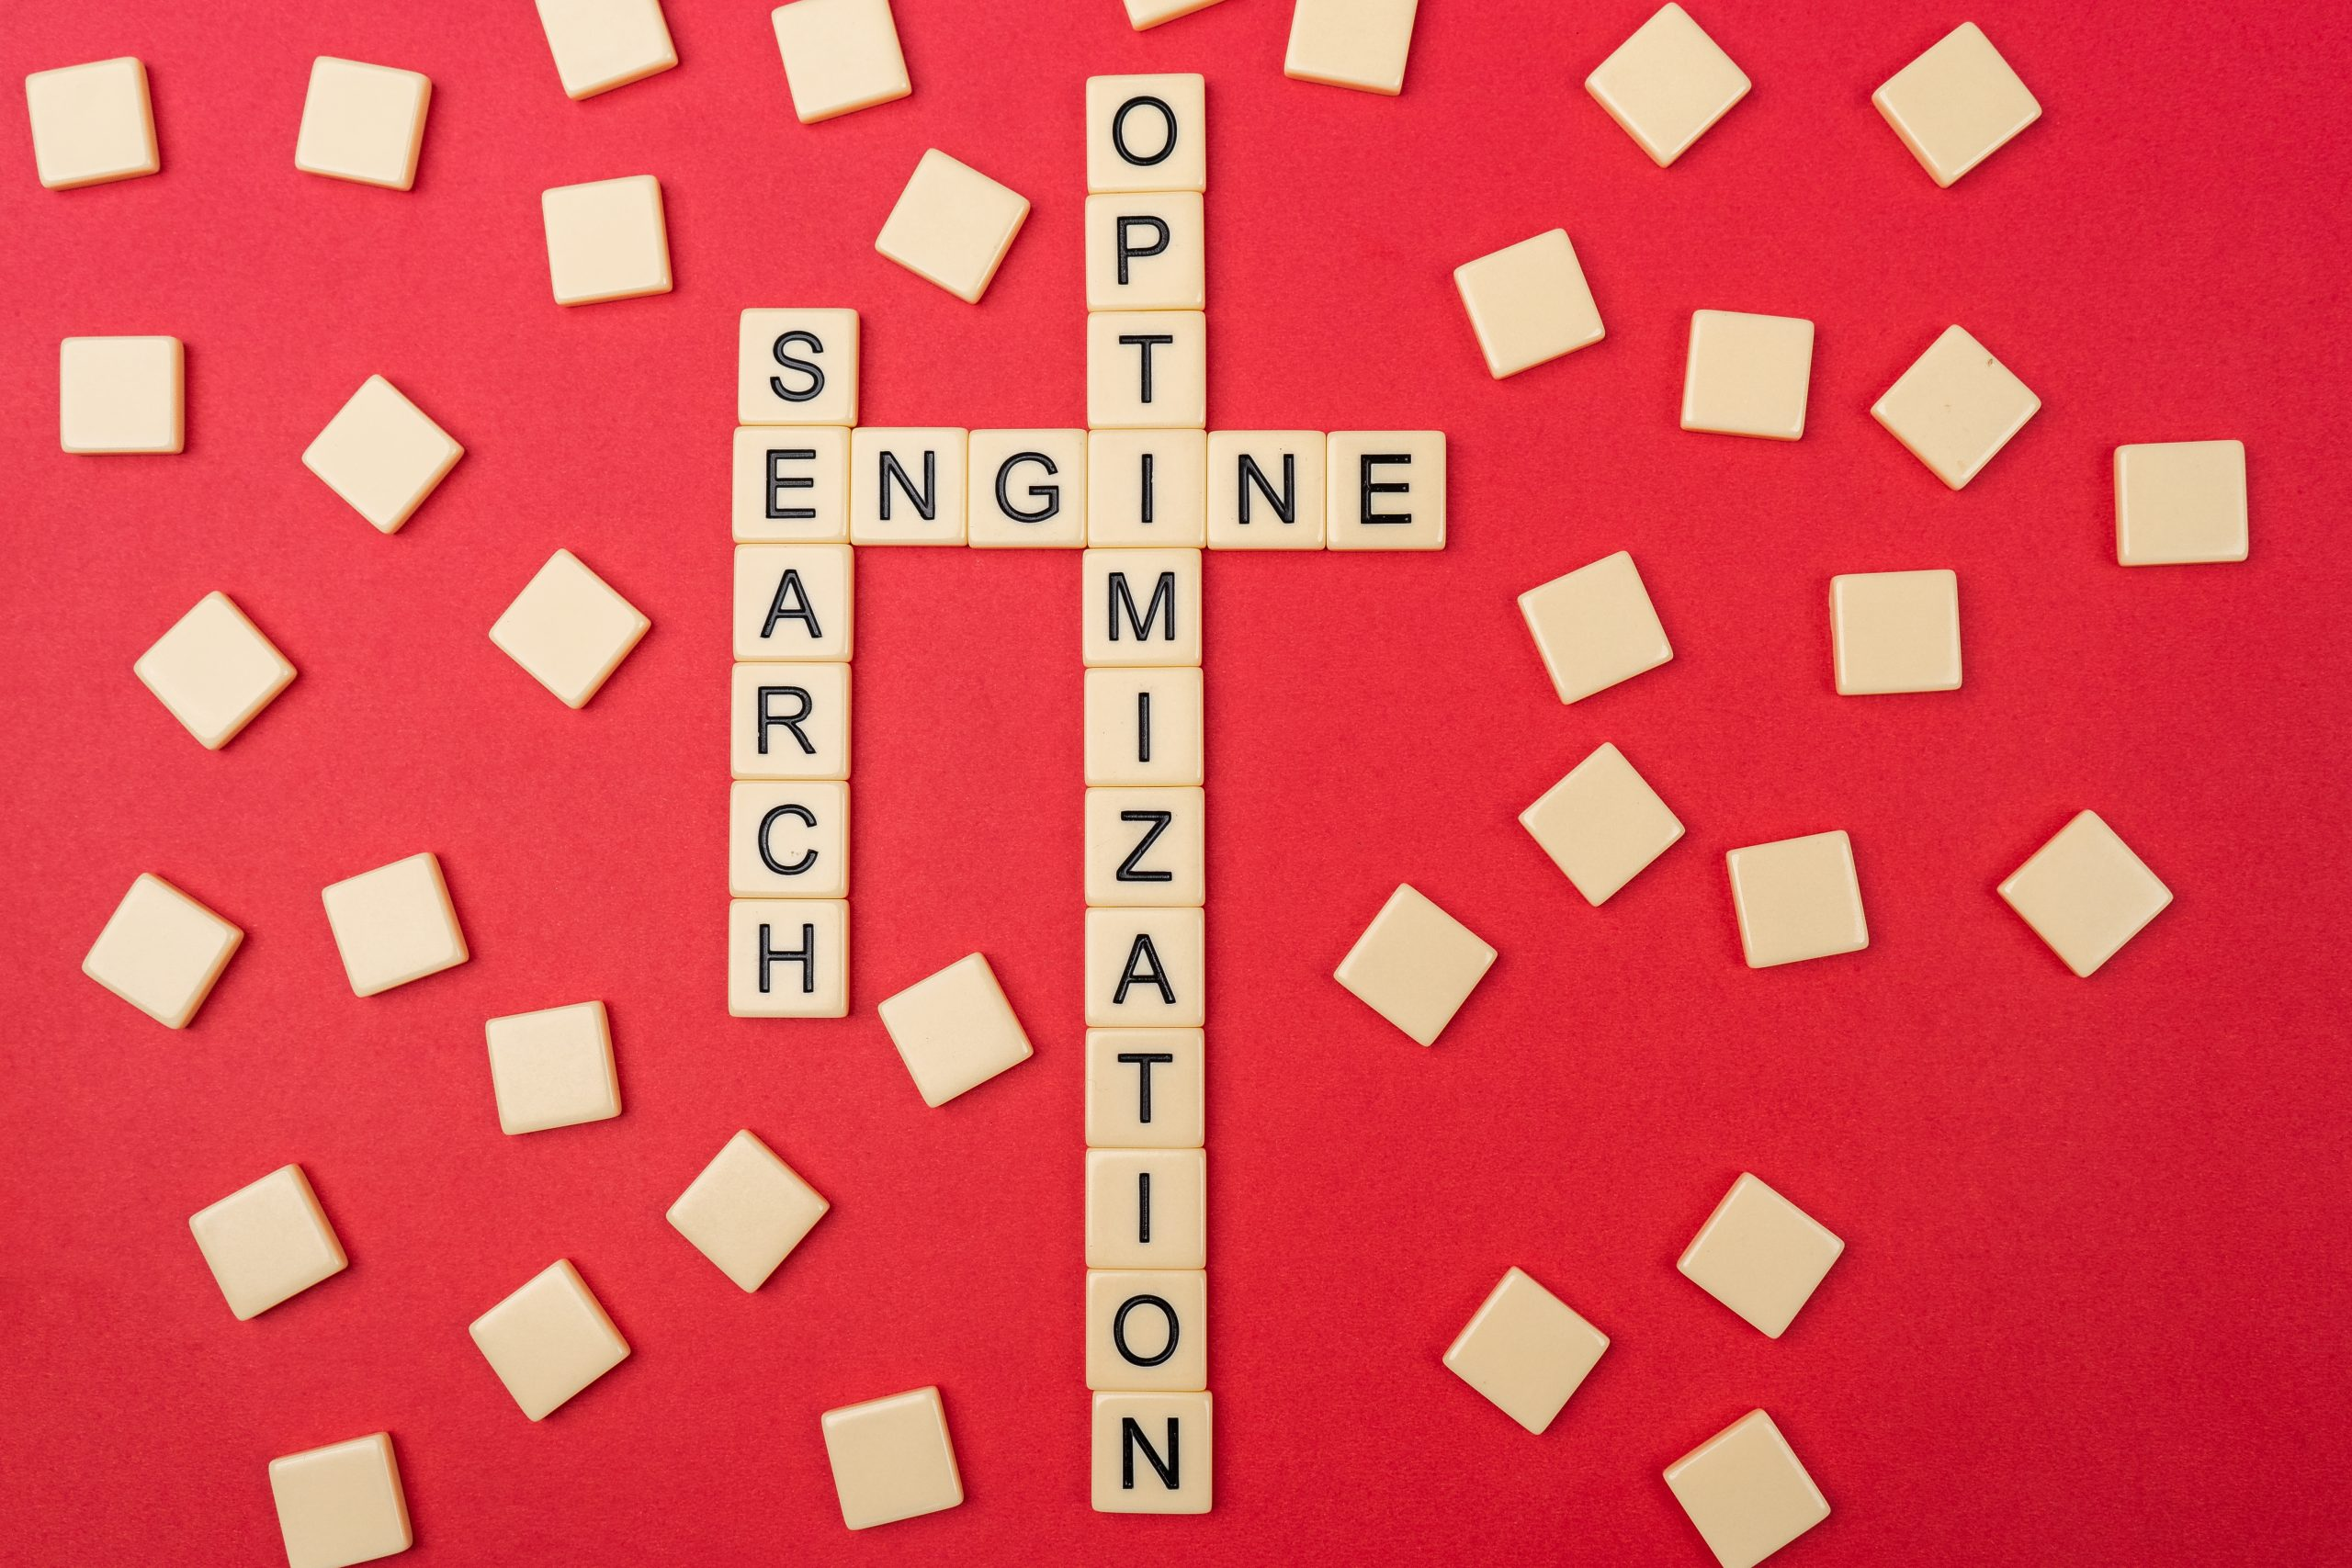 Search engine optimization written on scrabble